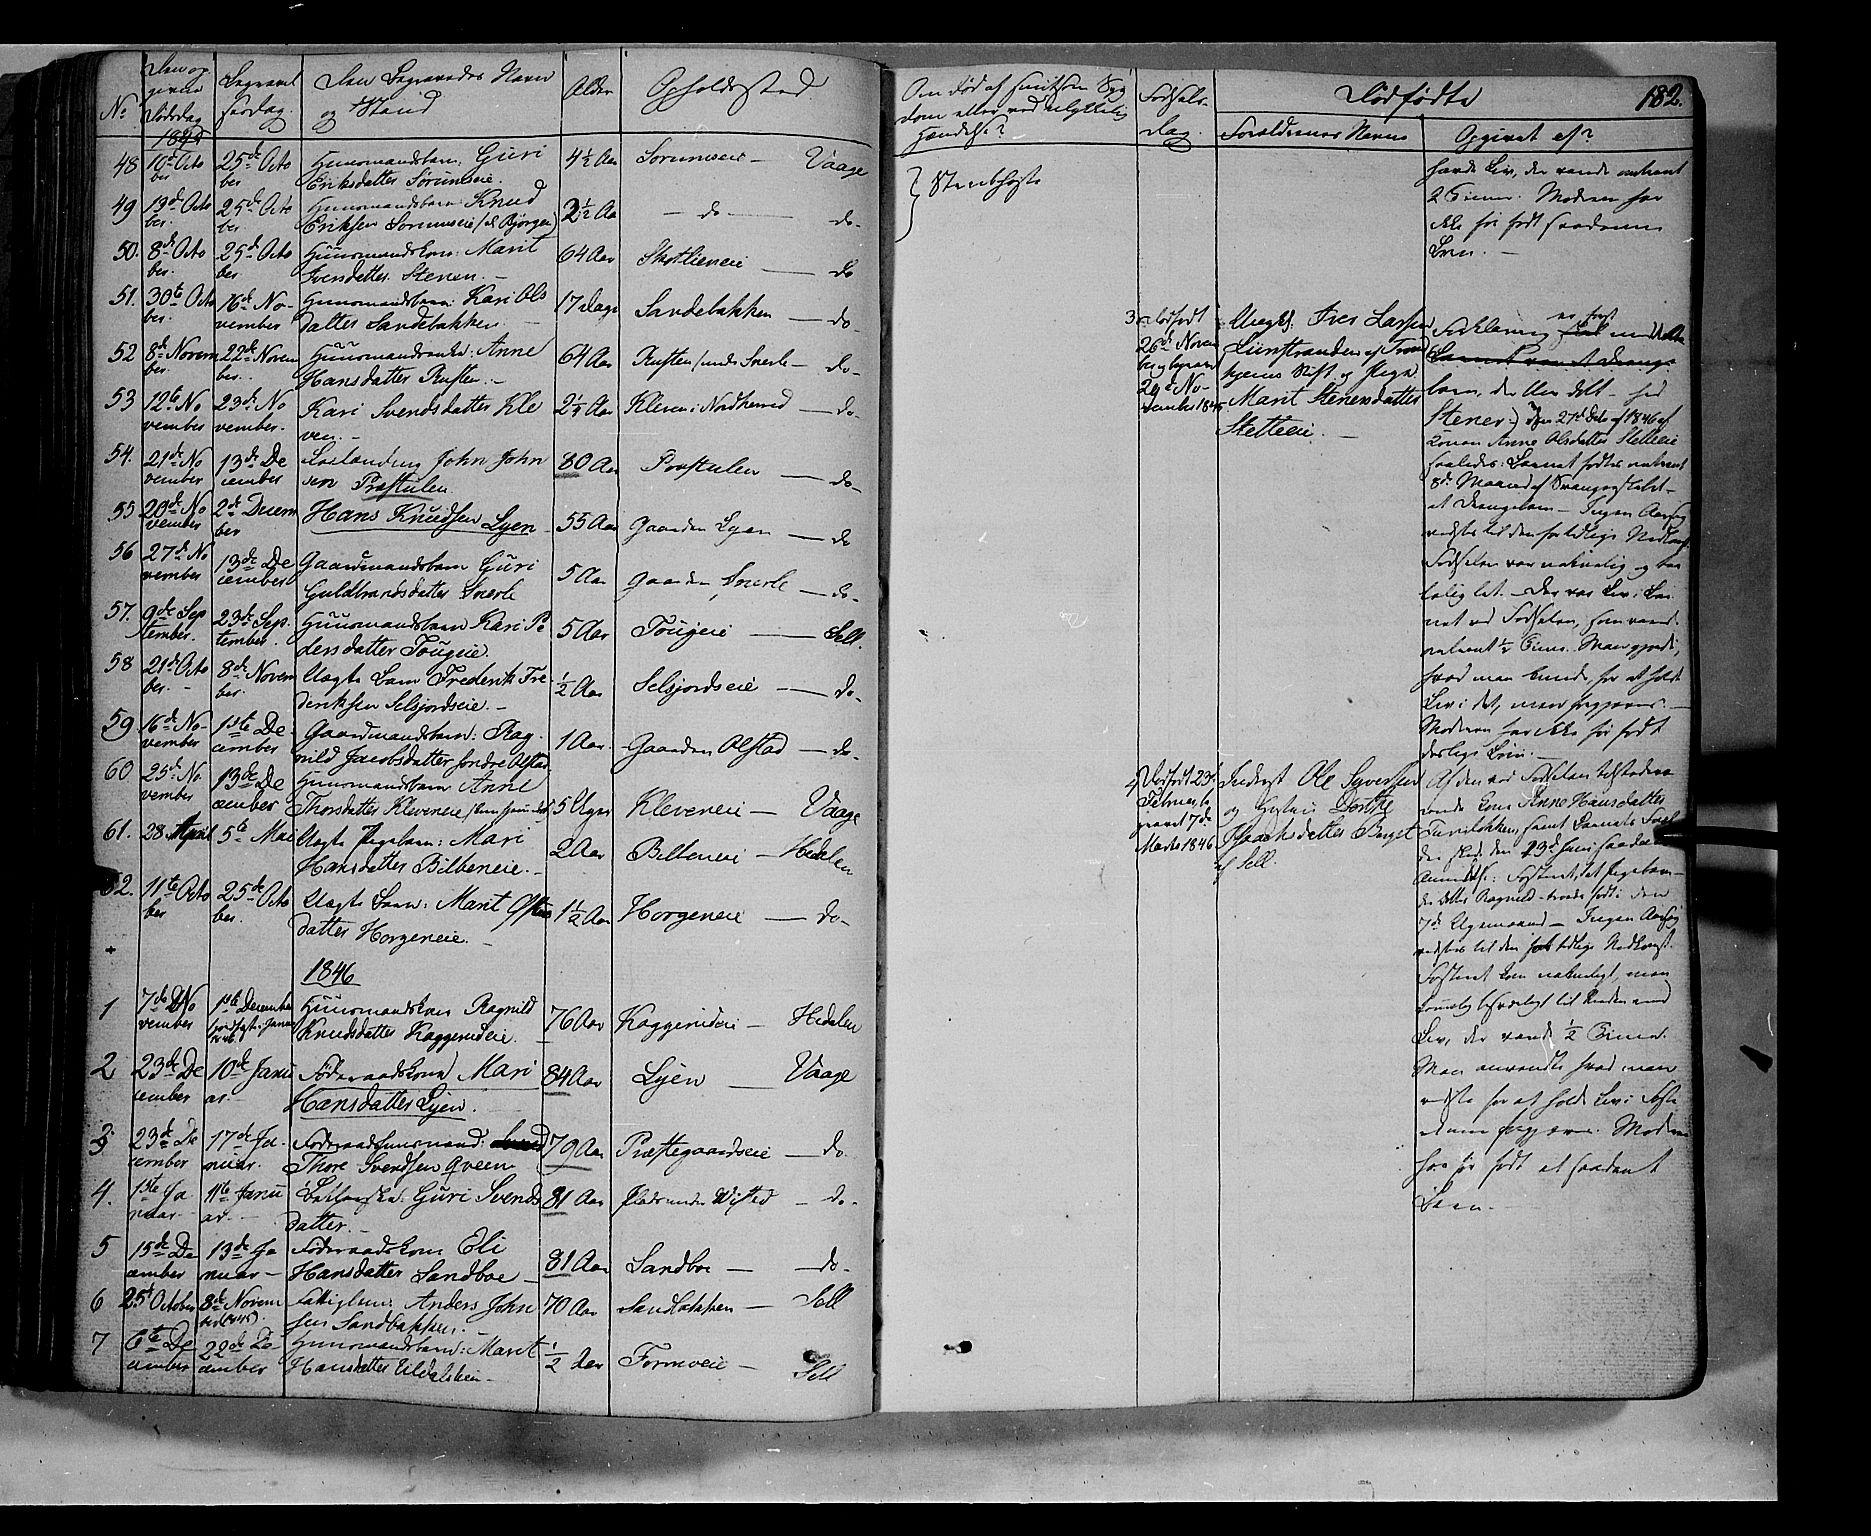 SAH, Vågå prestekontor, Ministerialbok nr. 5 /1, 1842-1856, s. 182